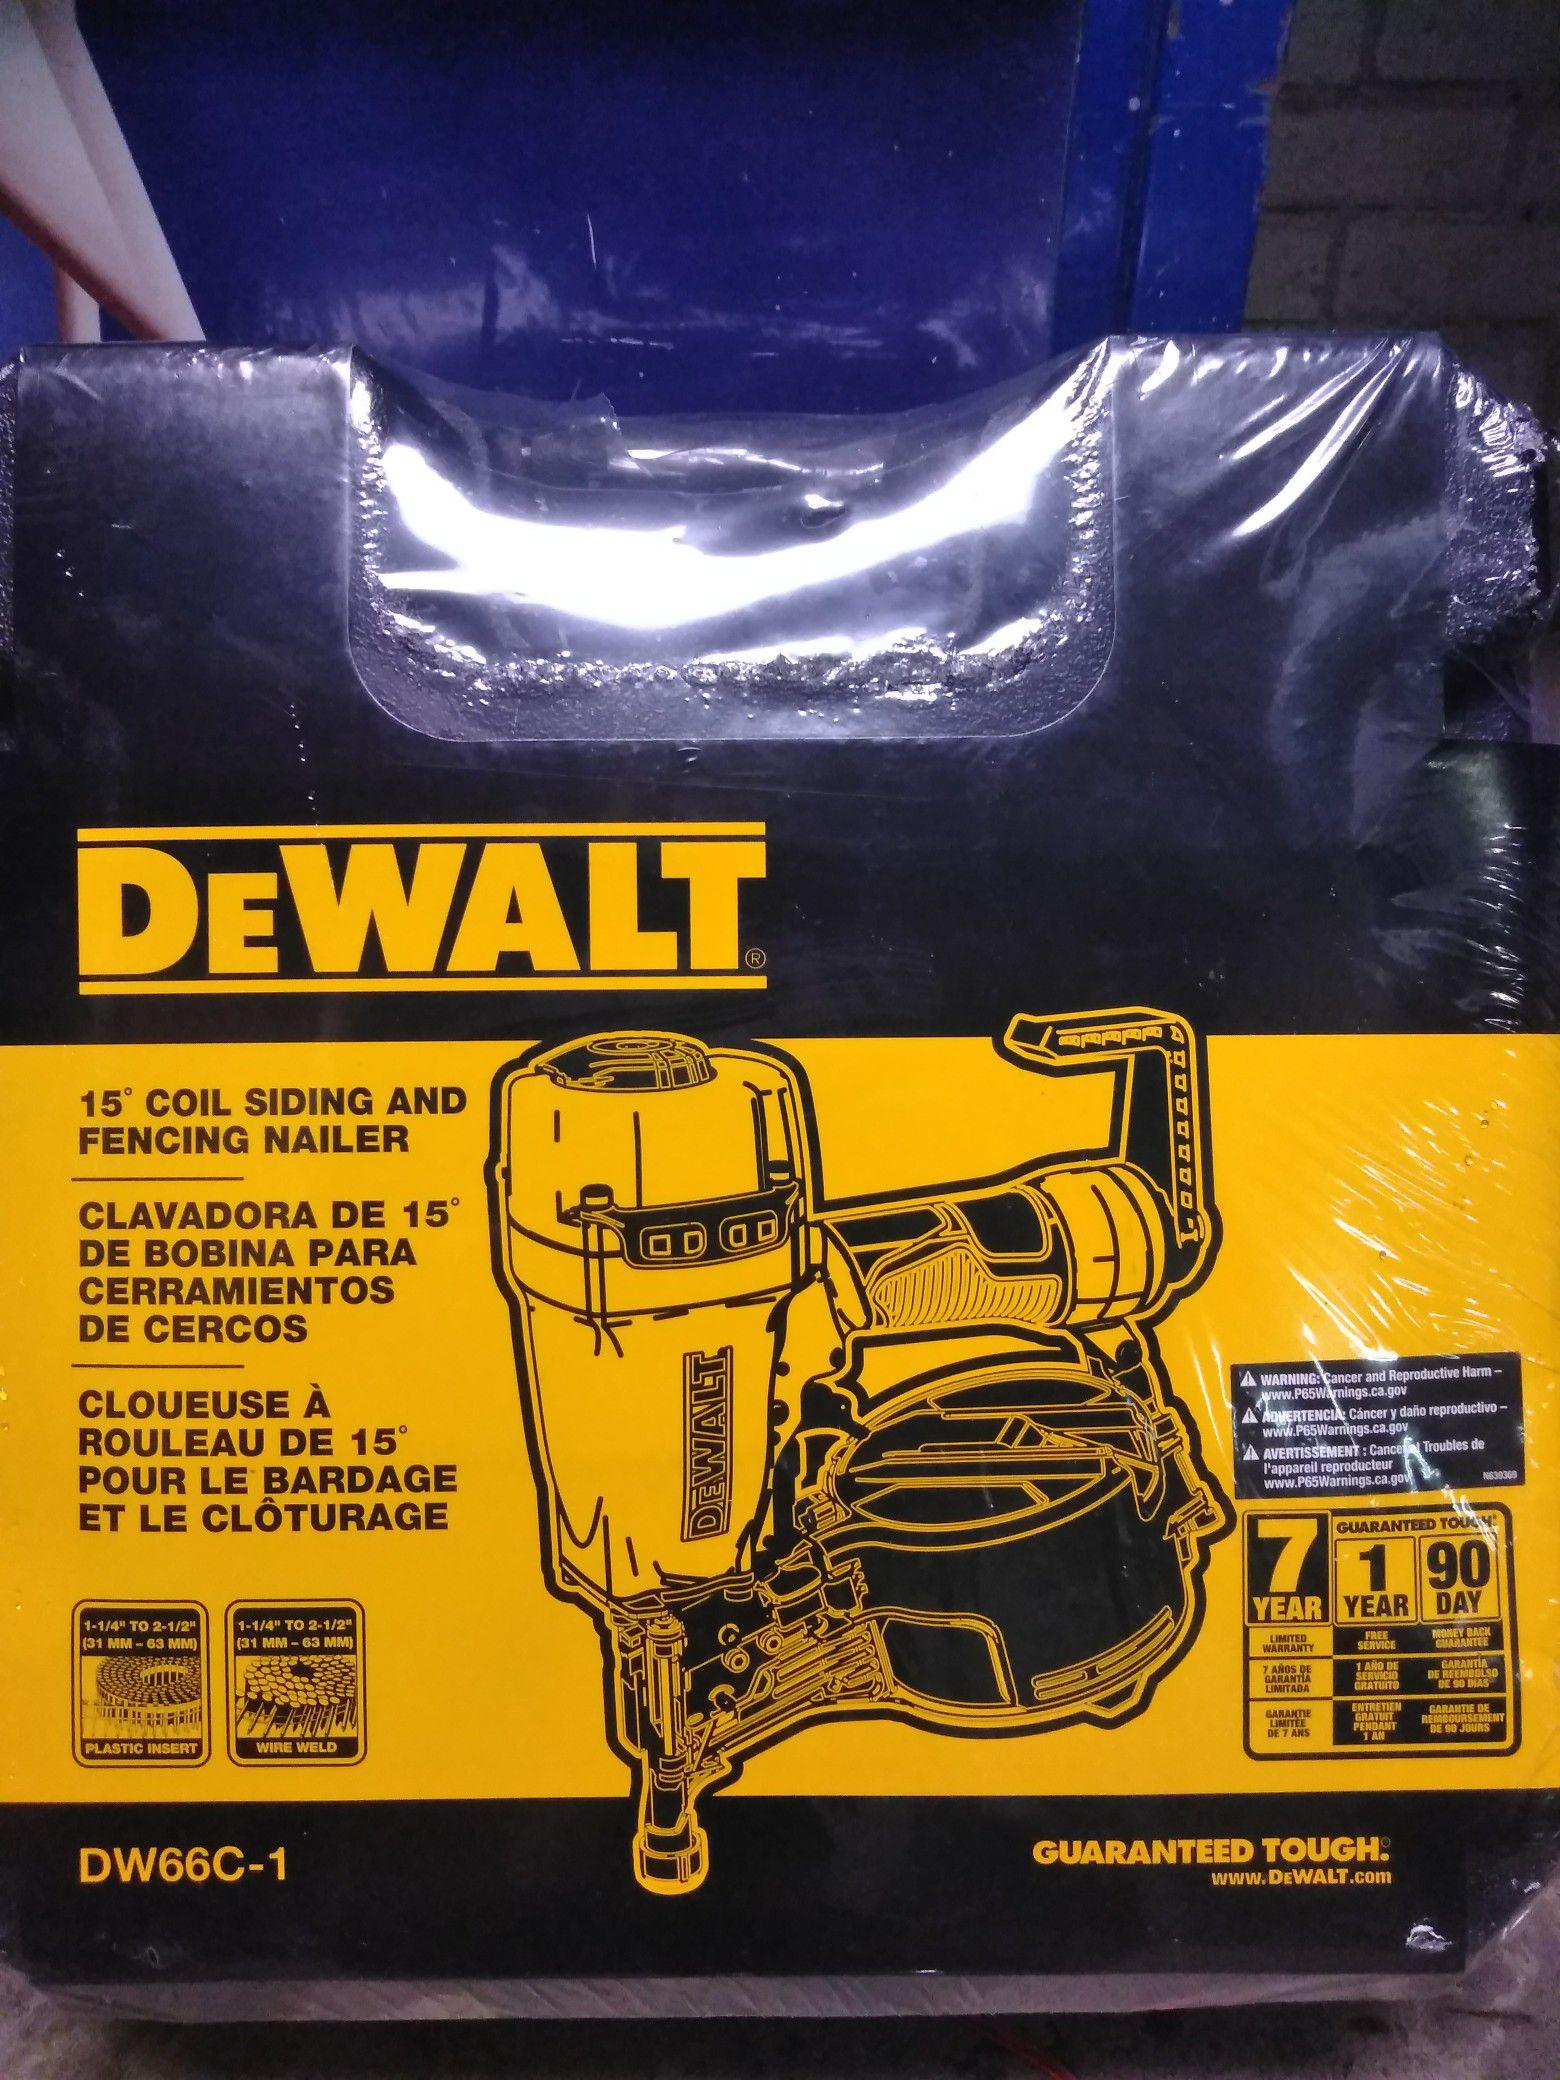 Brand new DeWalt •15 Coil Siding & Fencing Nailer